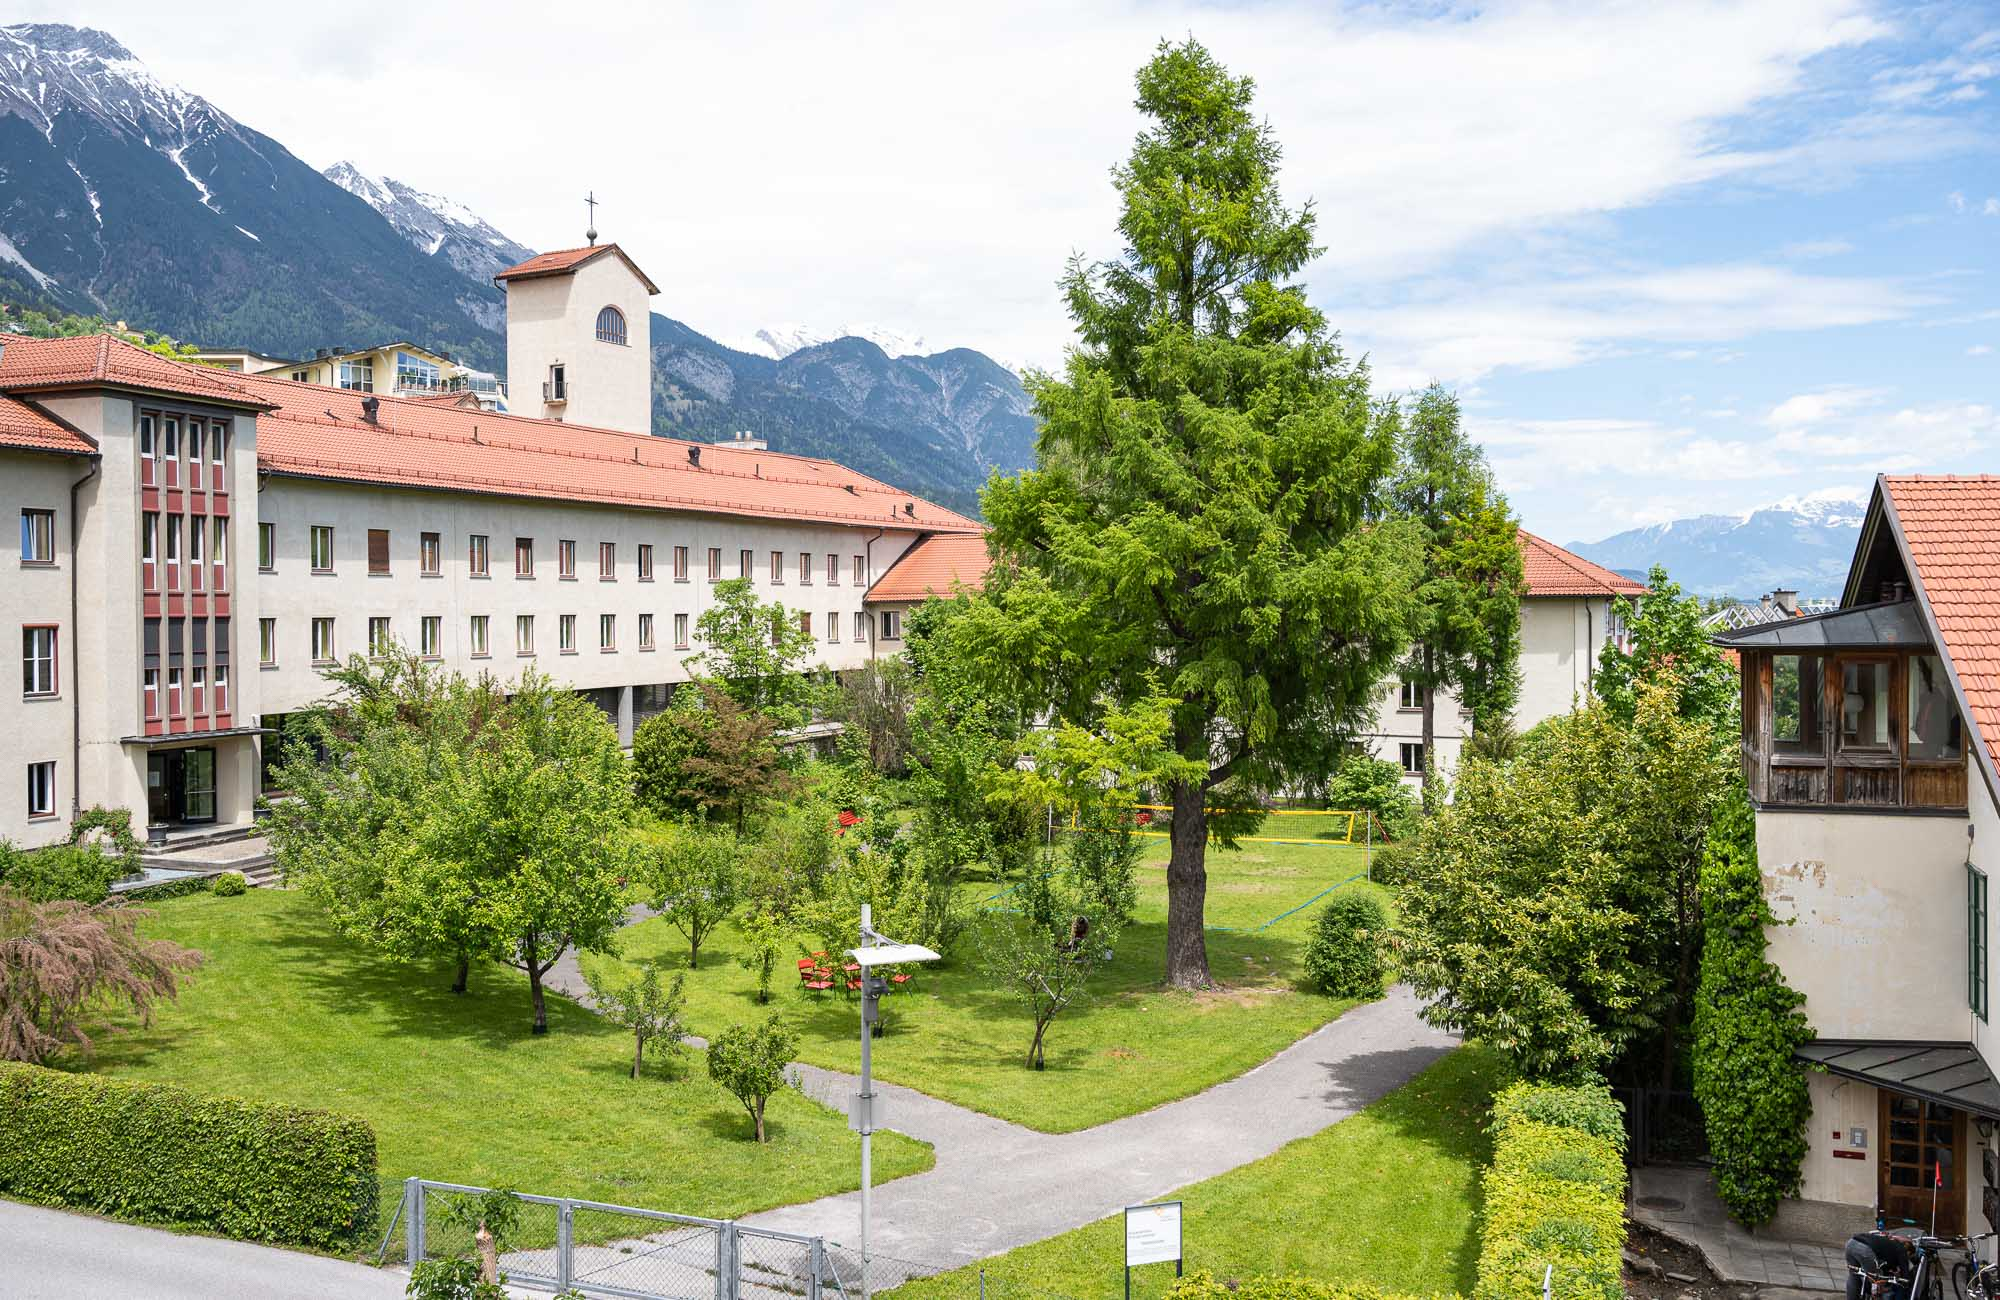 Absteige Innsbruck, Ferienapartment, Ausblick